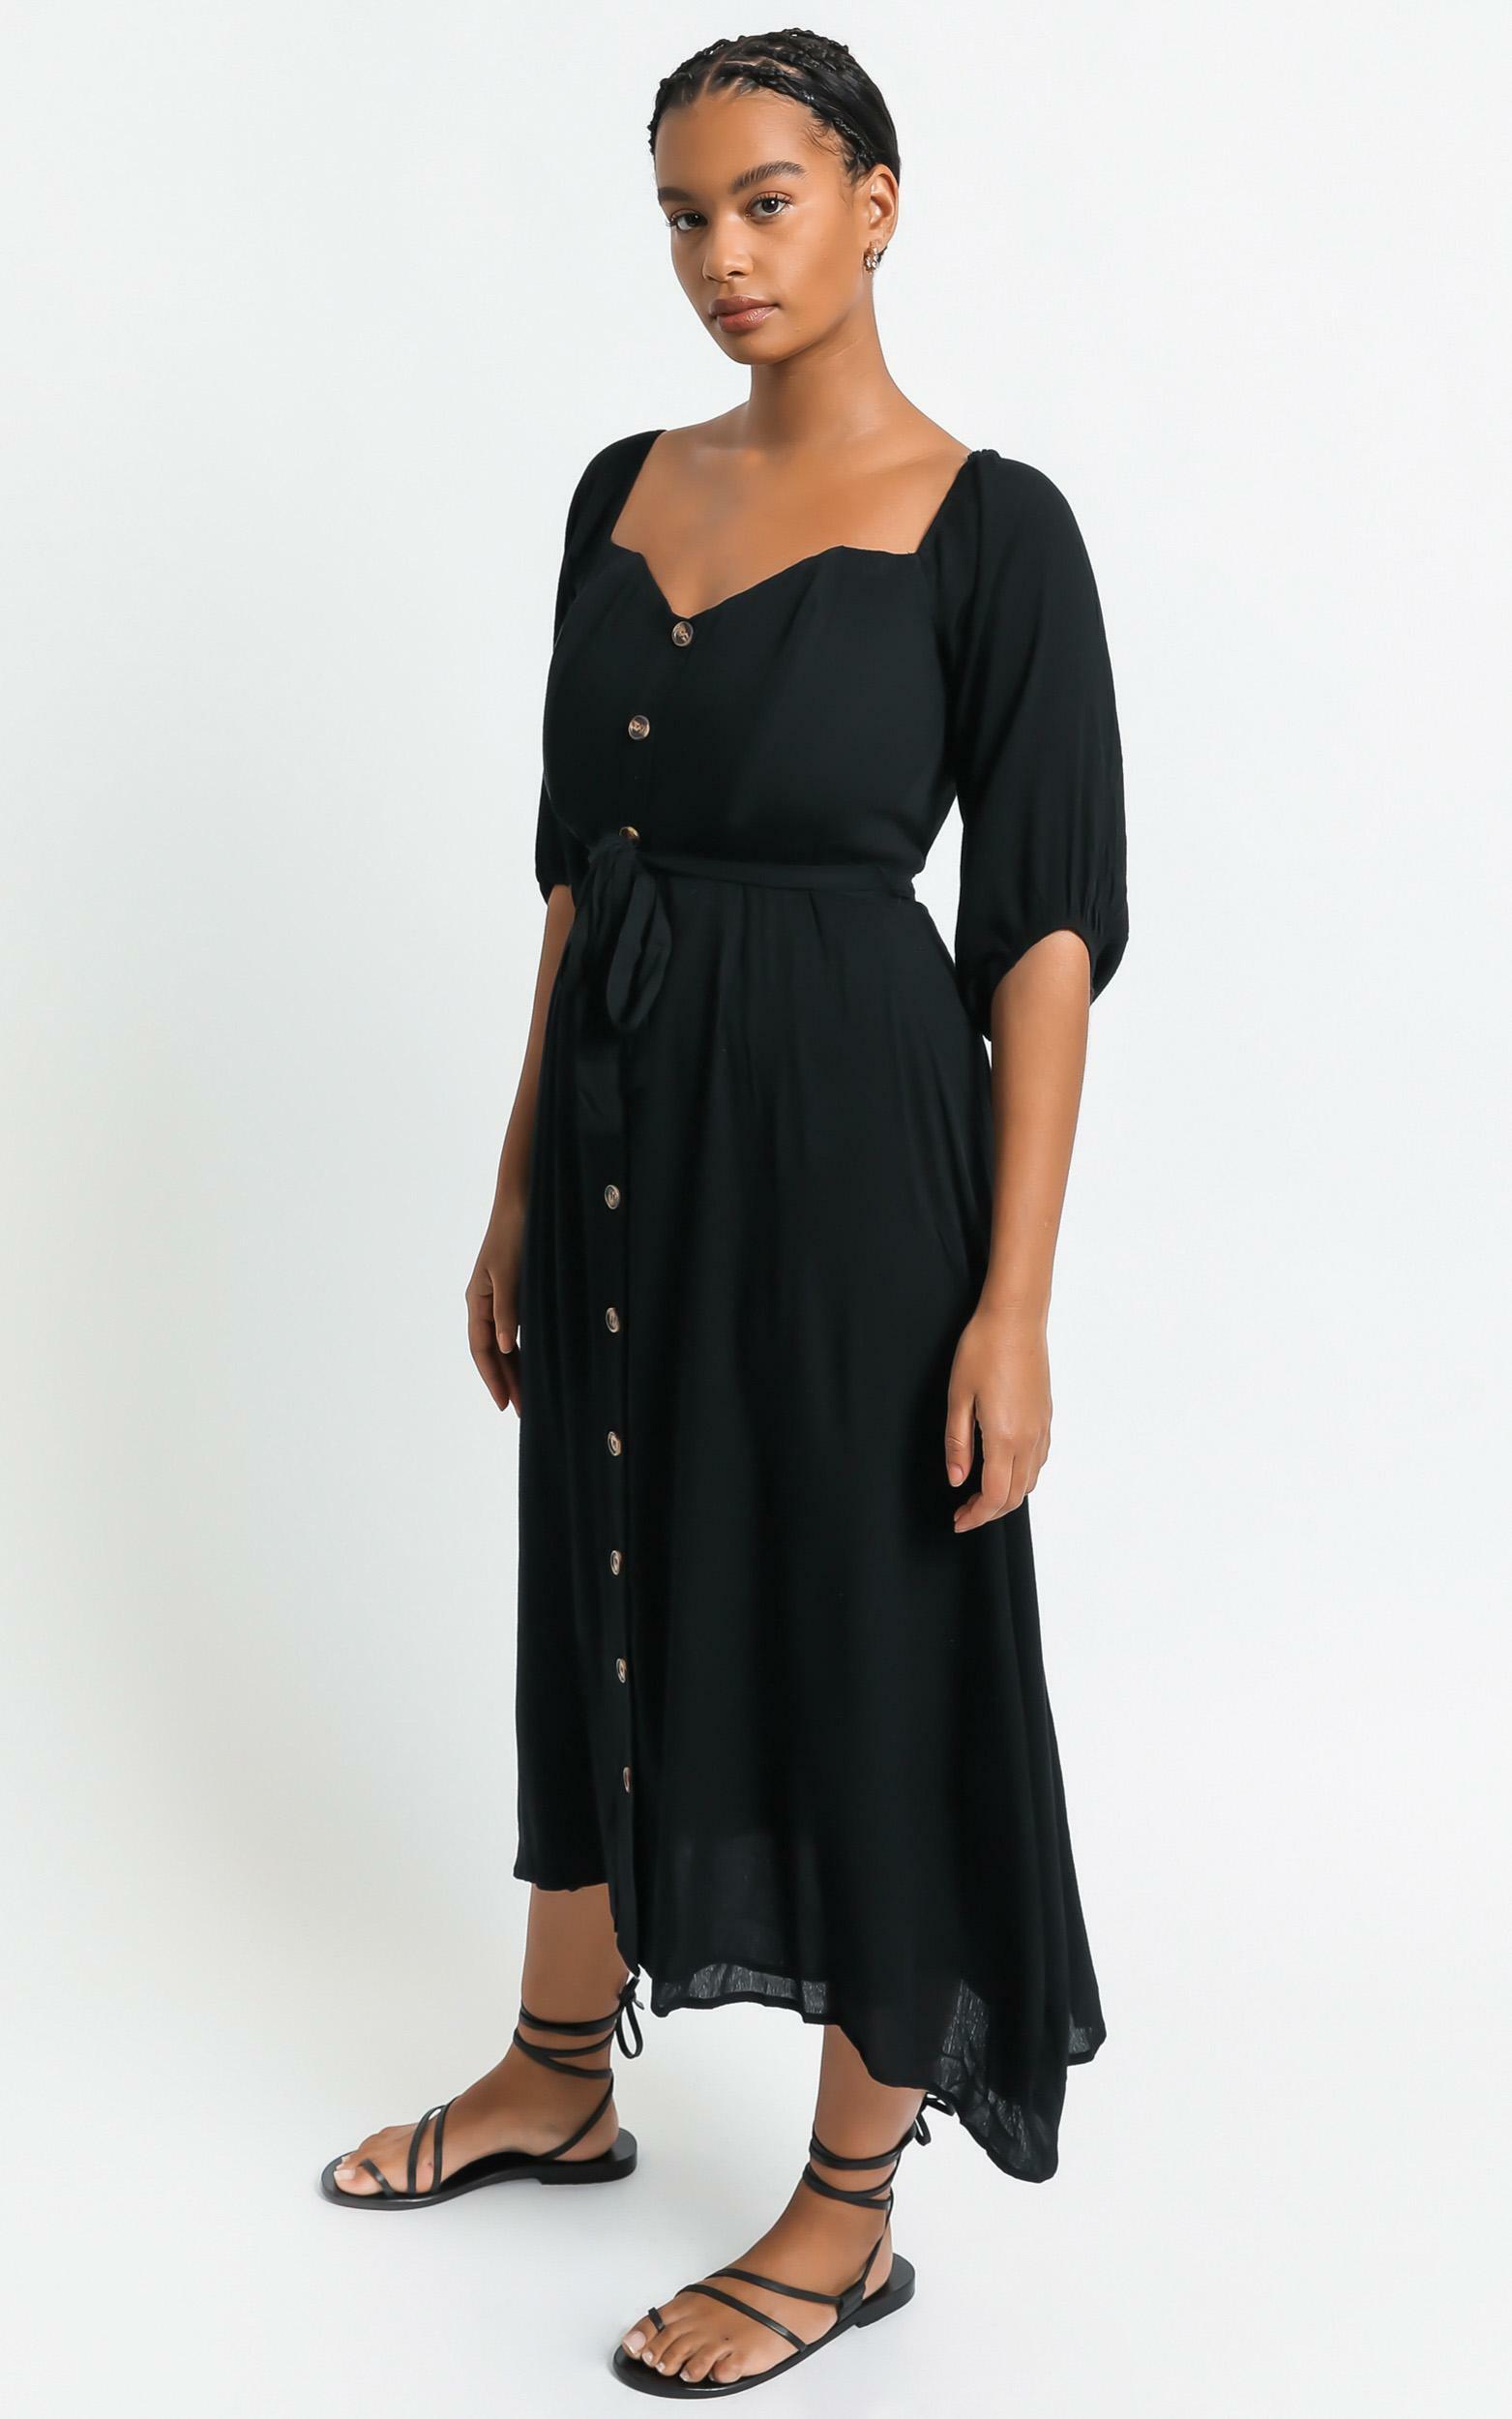 Sorrento Dreaming Dress in Black Linen Look - 4 (XXS), Black, hi-res image number null